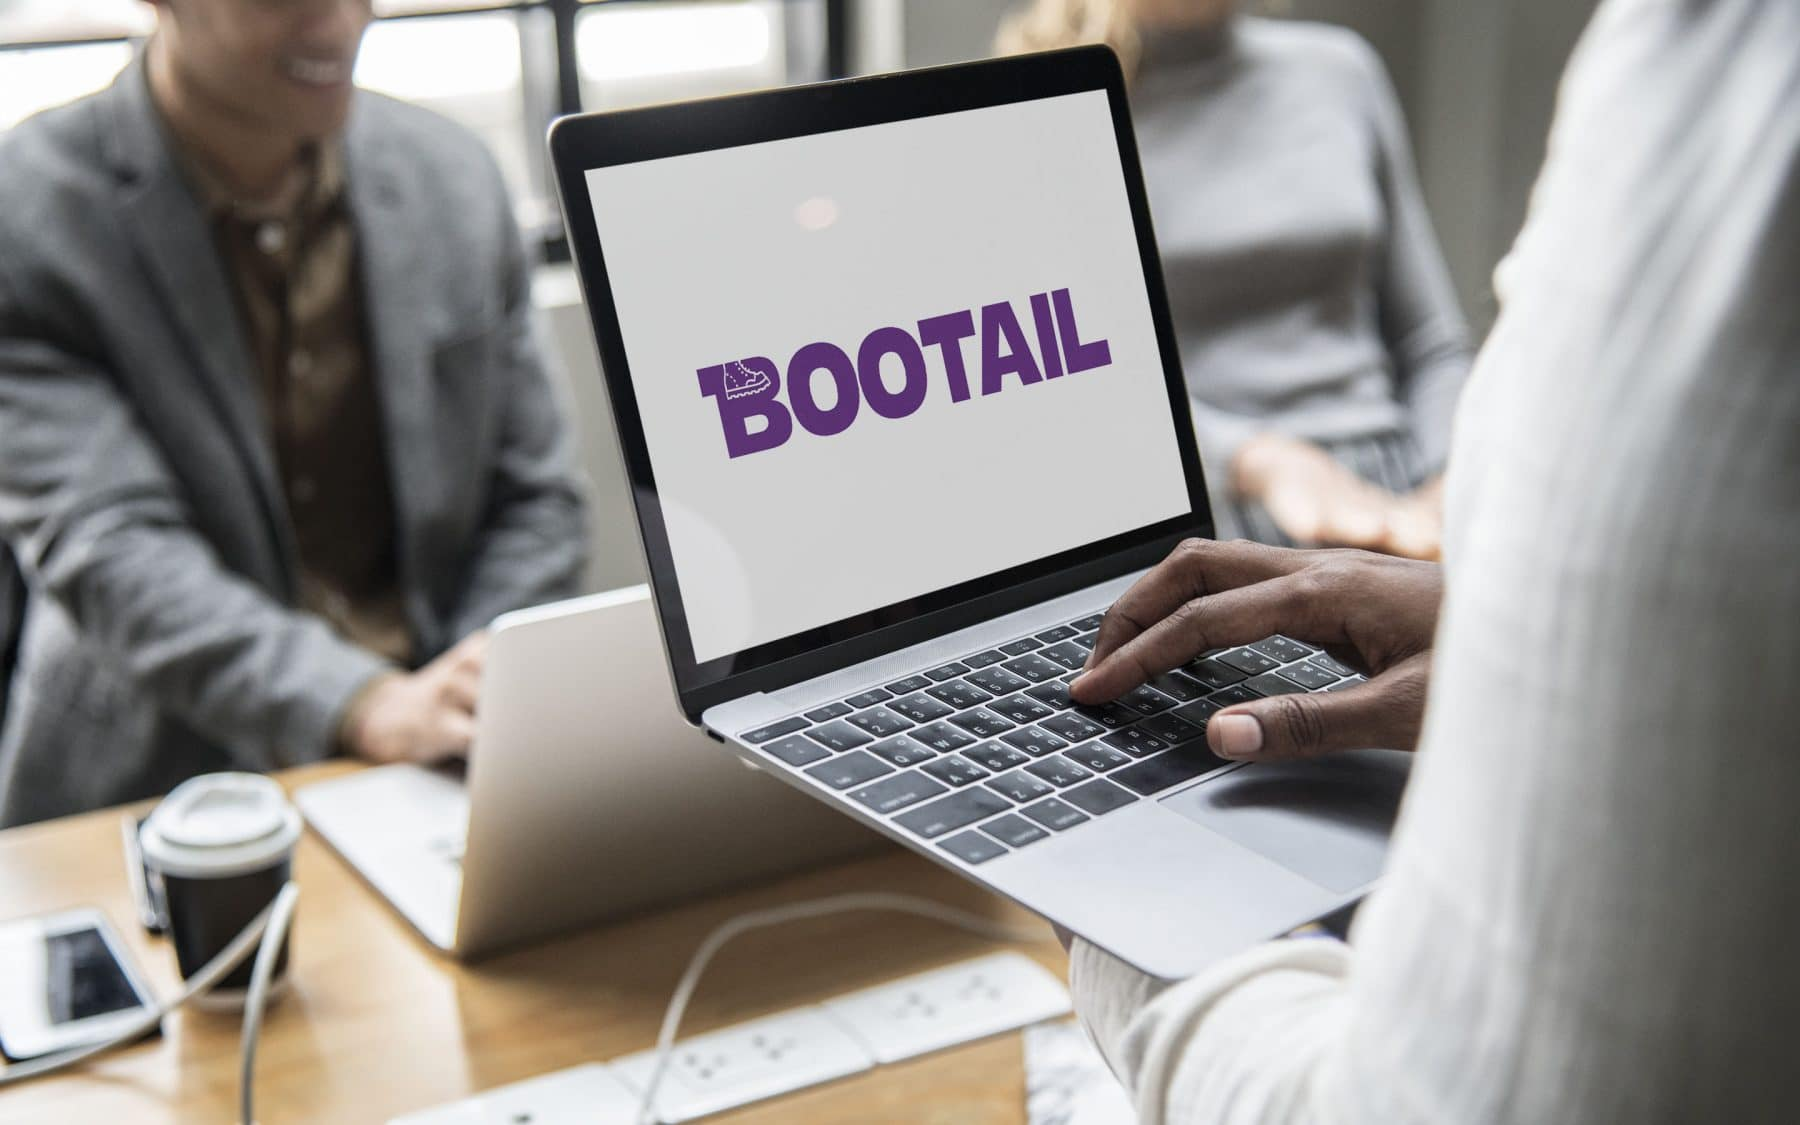 Bootail 2